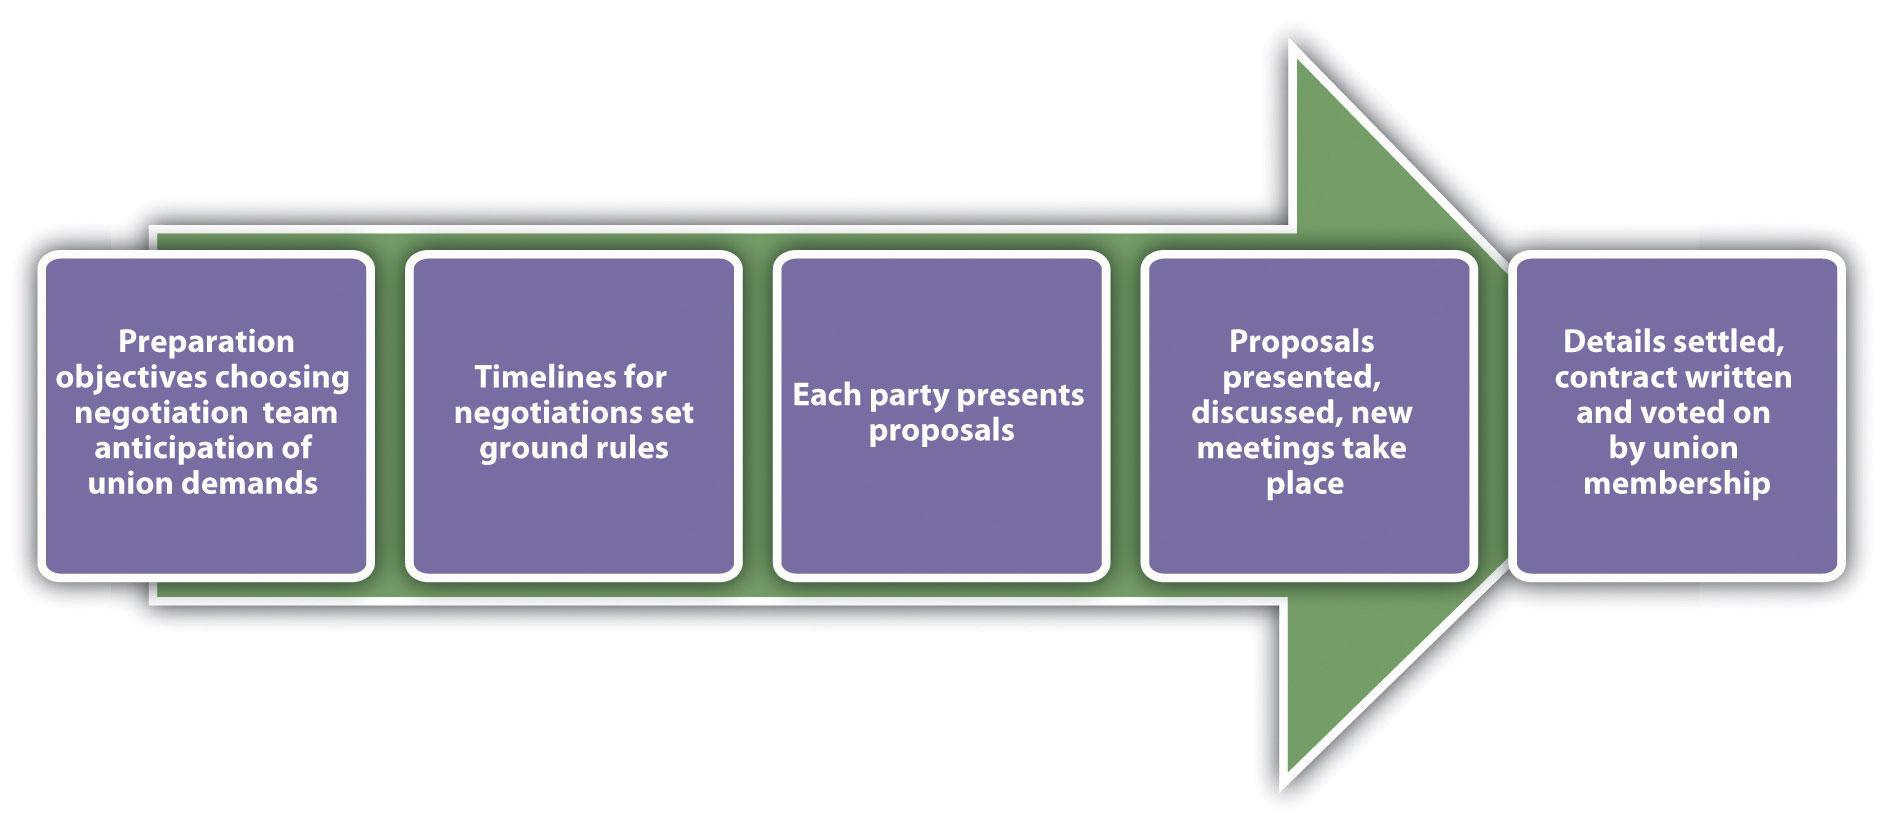 Examples of bargaining topics